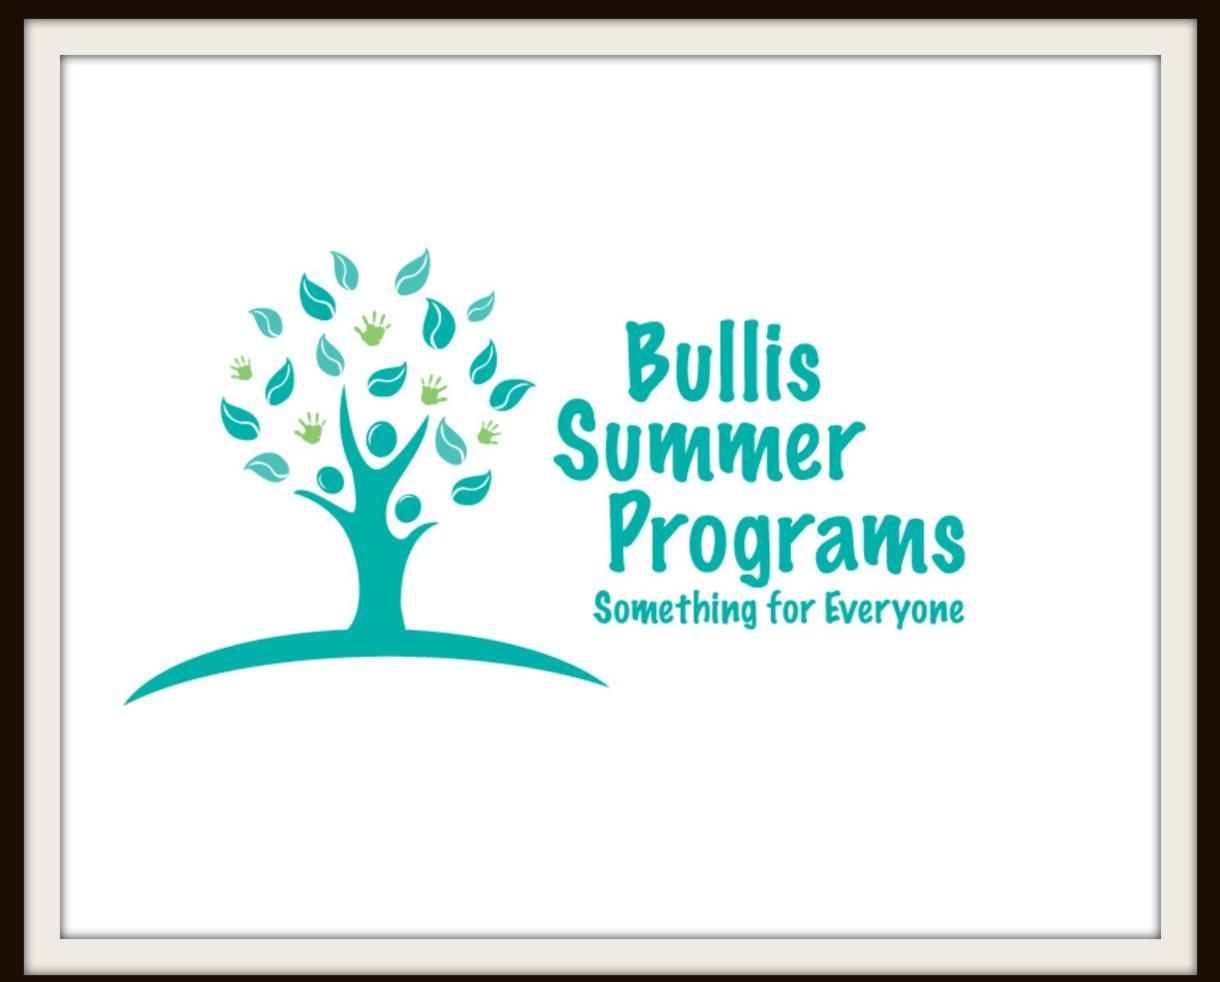 One Week of Bullis Bulldog Day Camp